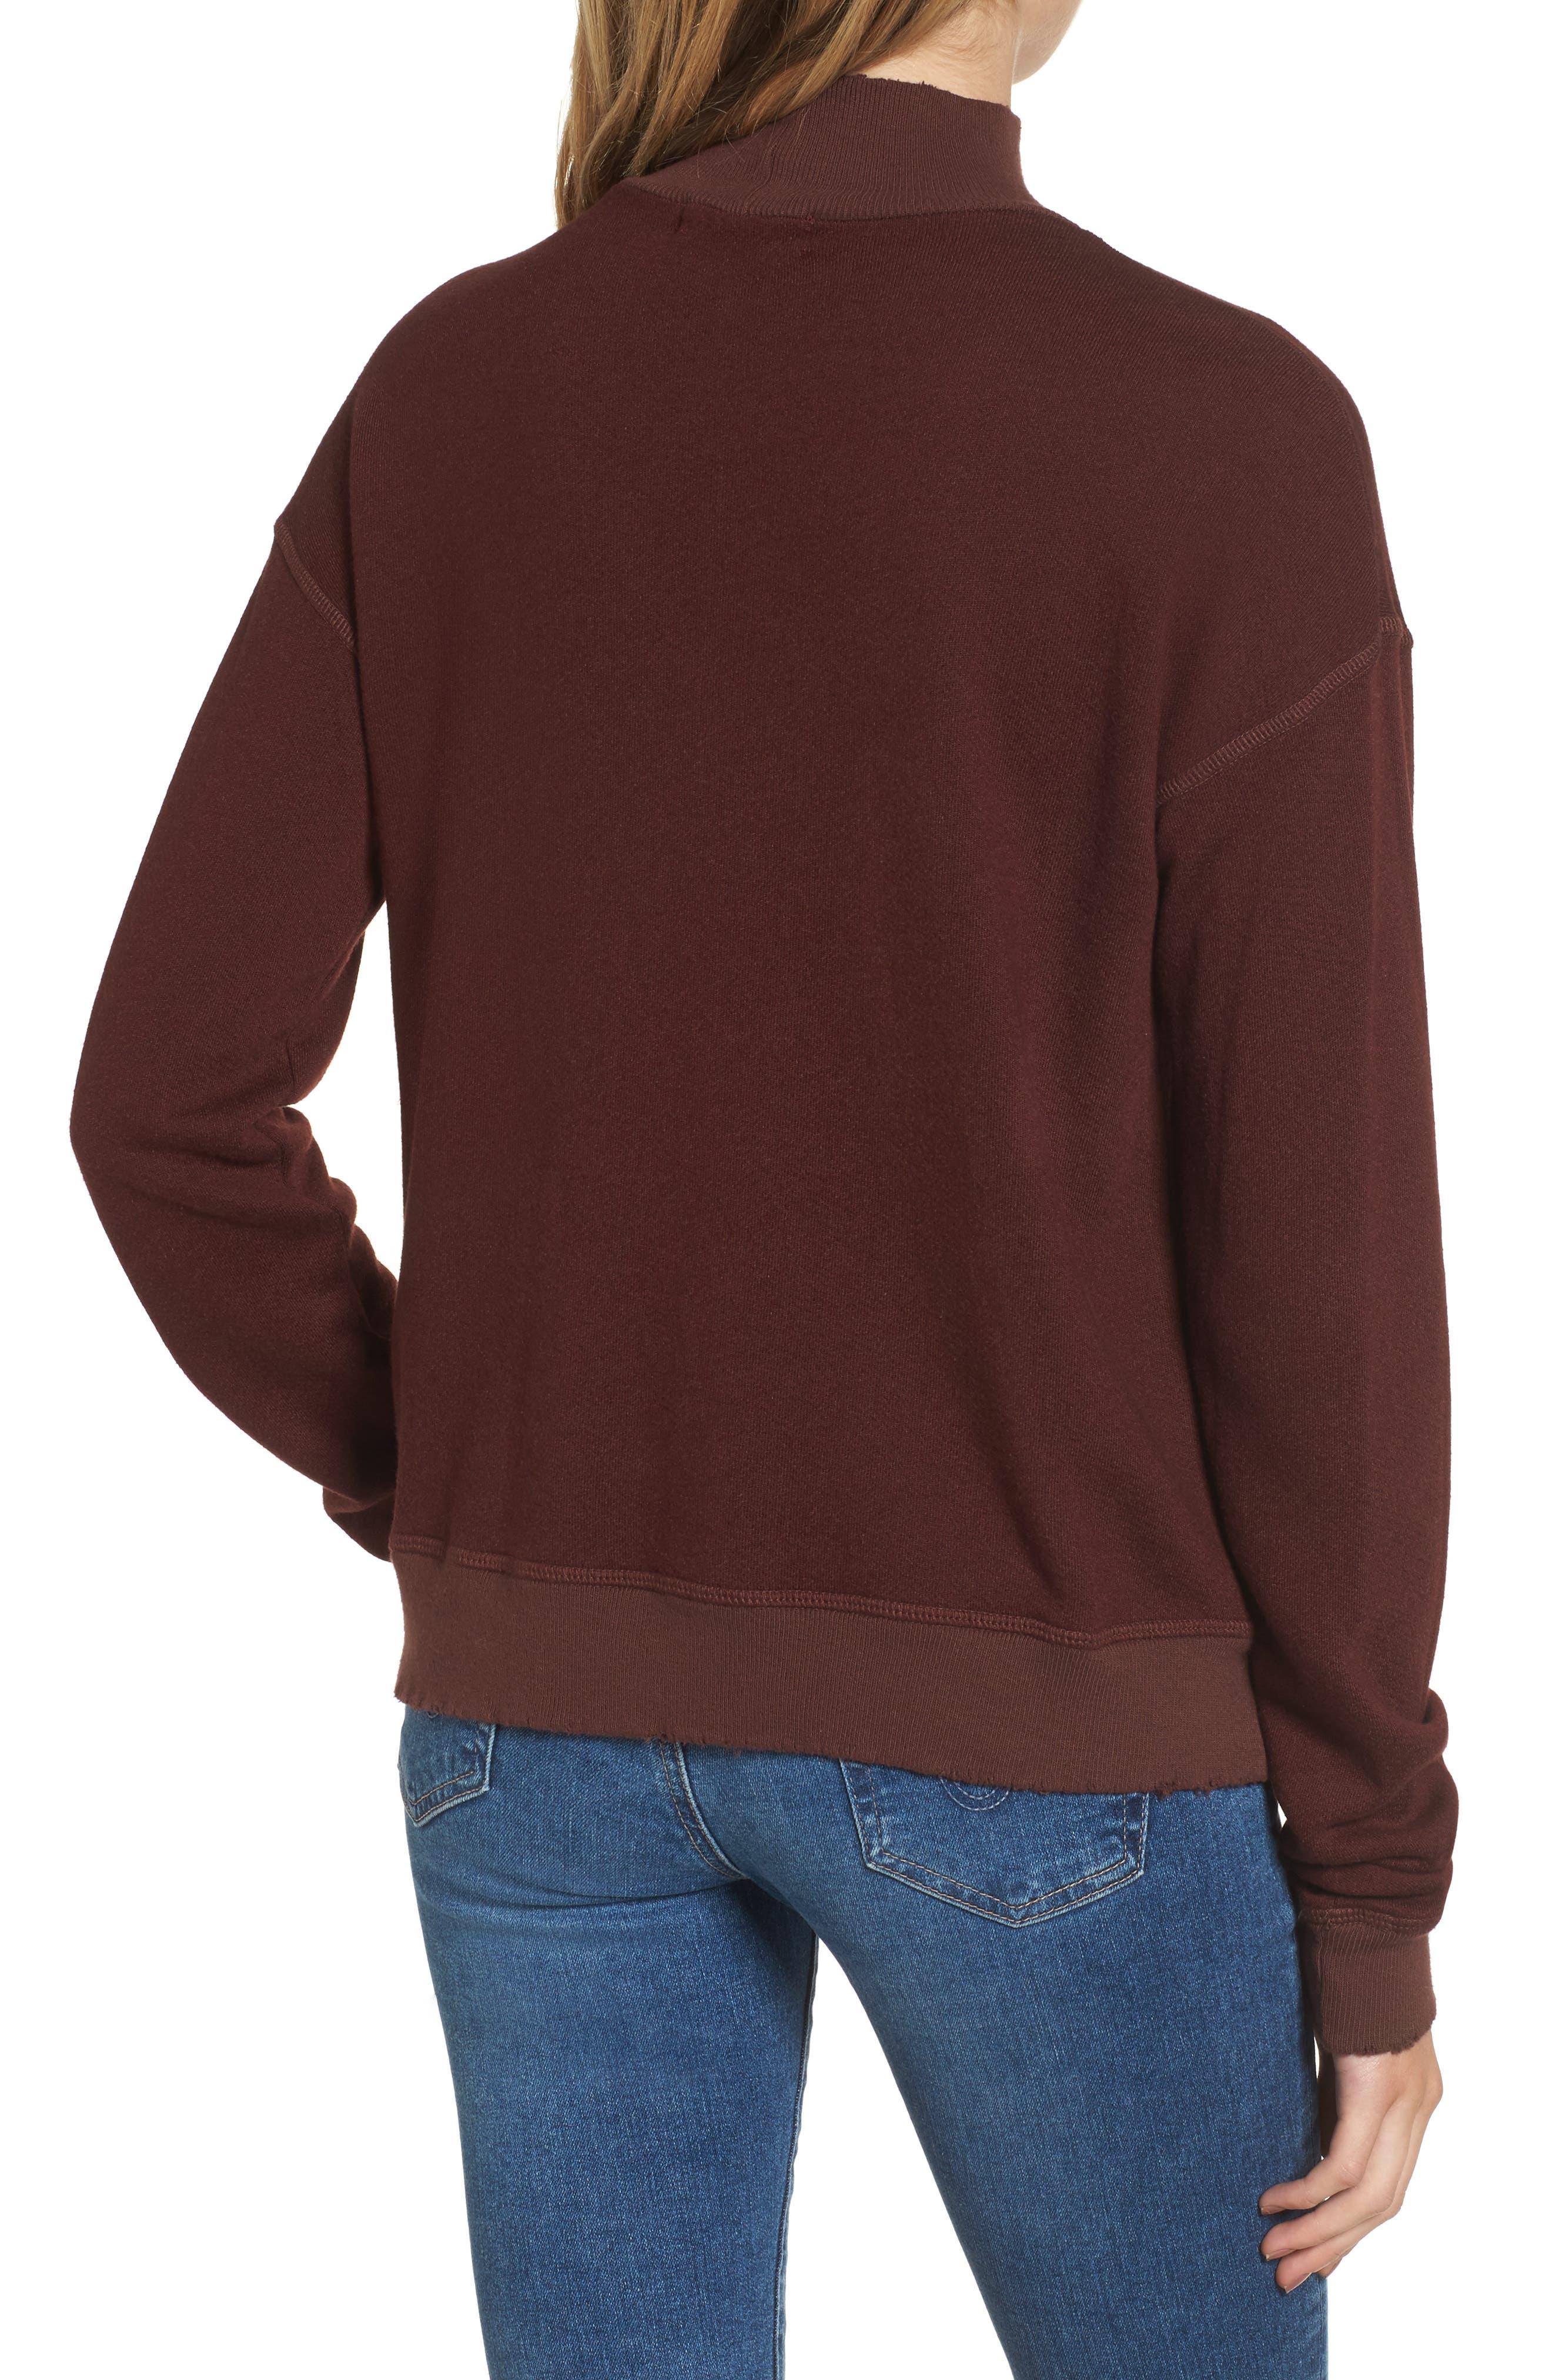 Bae Sweatshirt,                             Alternate thumbnail 2, color,                             930